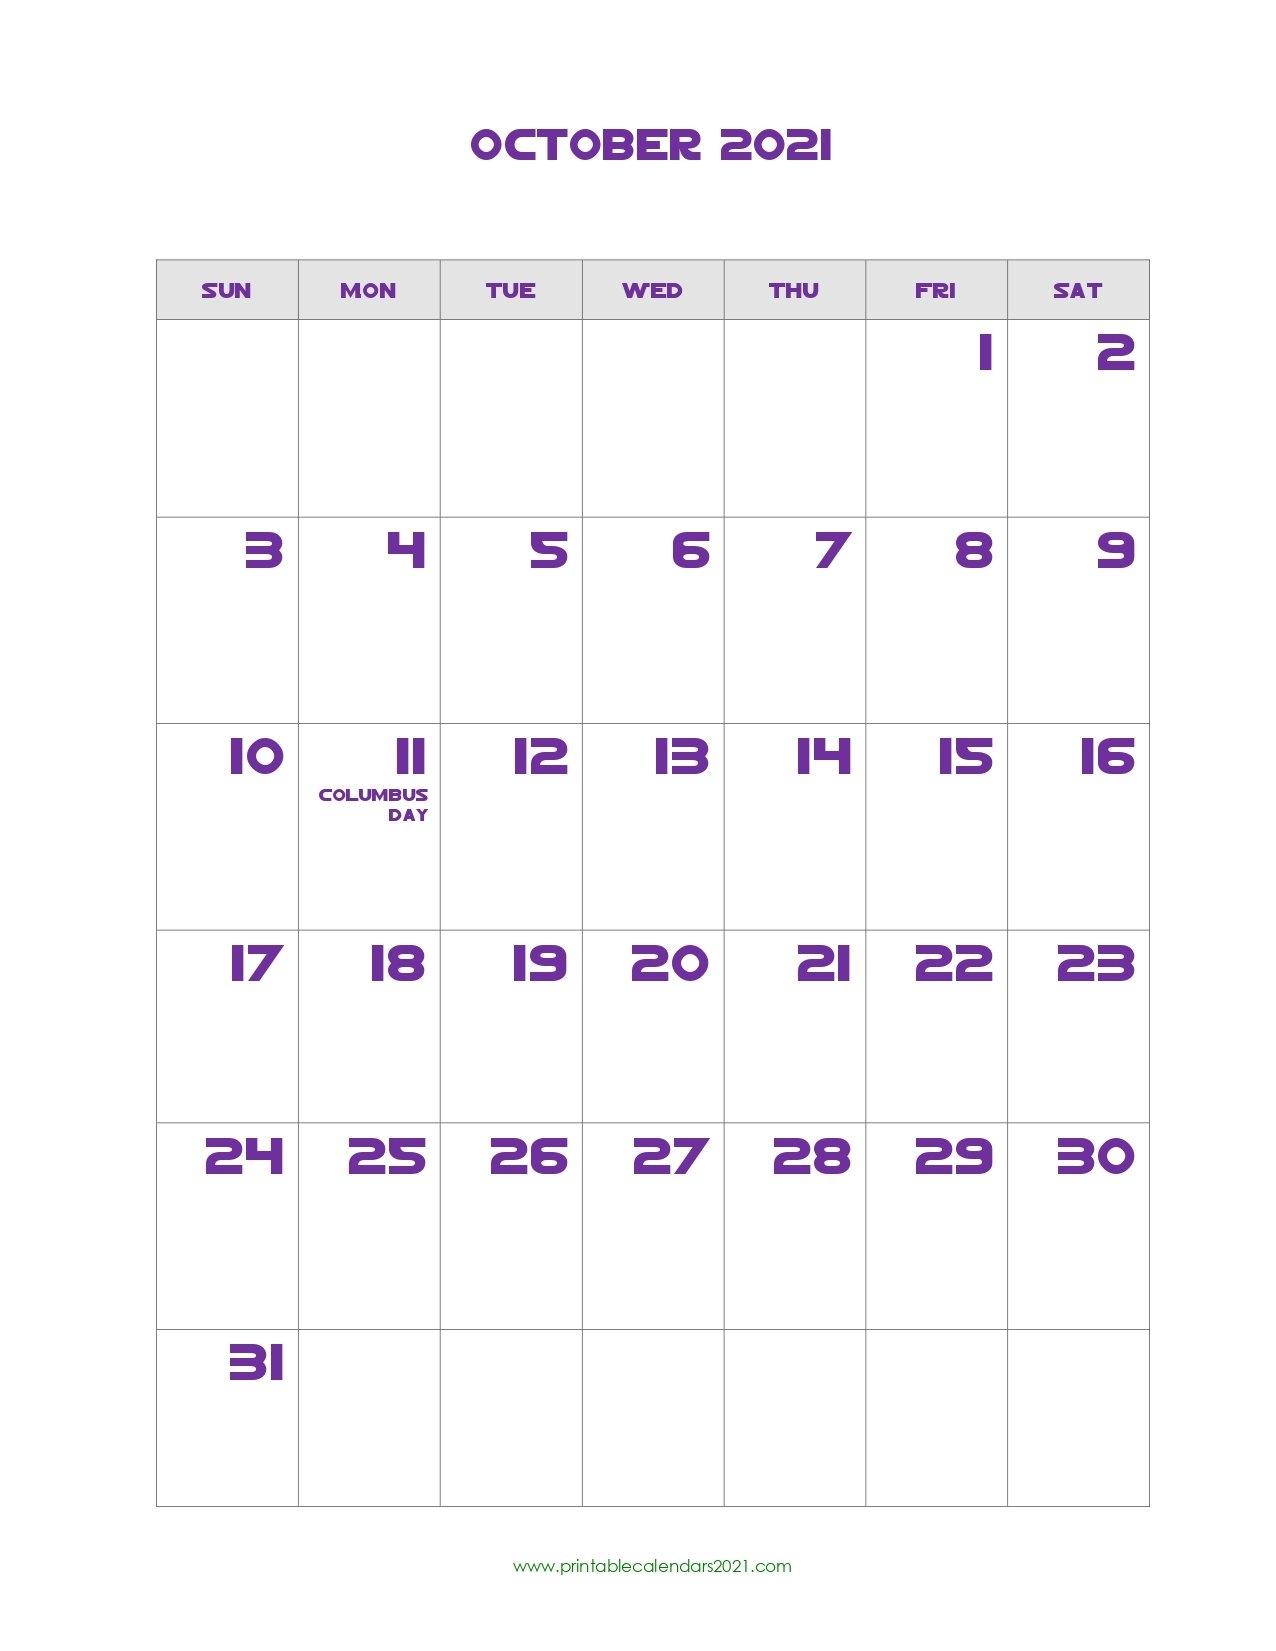 Printable Calendar October 2021, Printable 2021 Calendar With Holidays with regard to Free Printable Calendar October 2021 With Hoilday